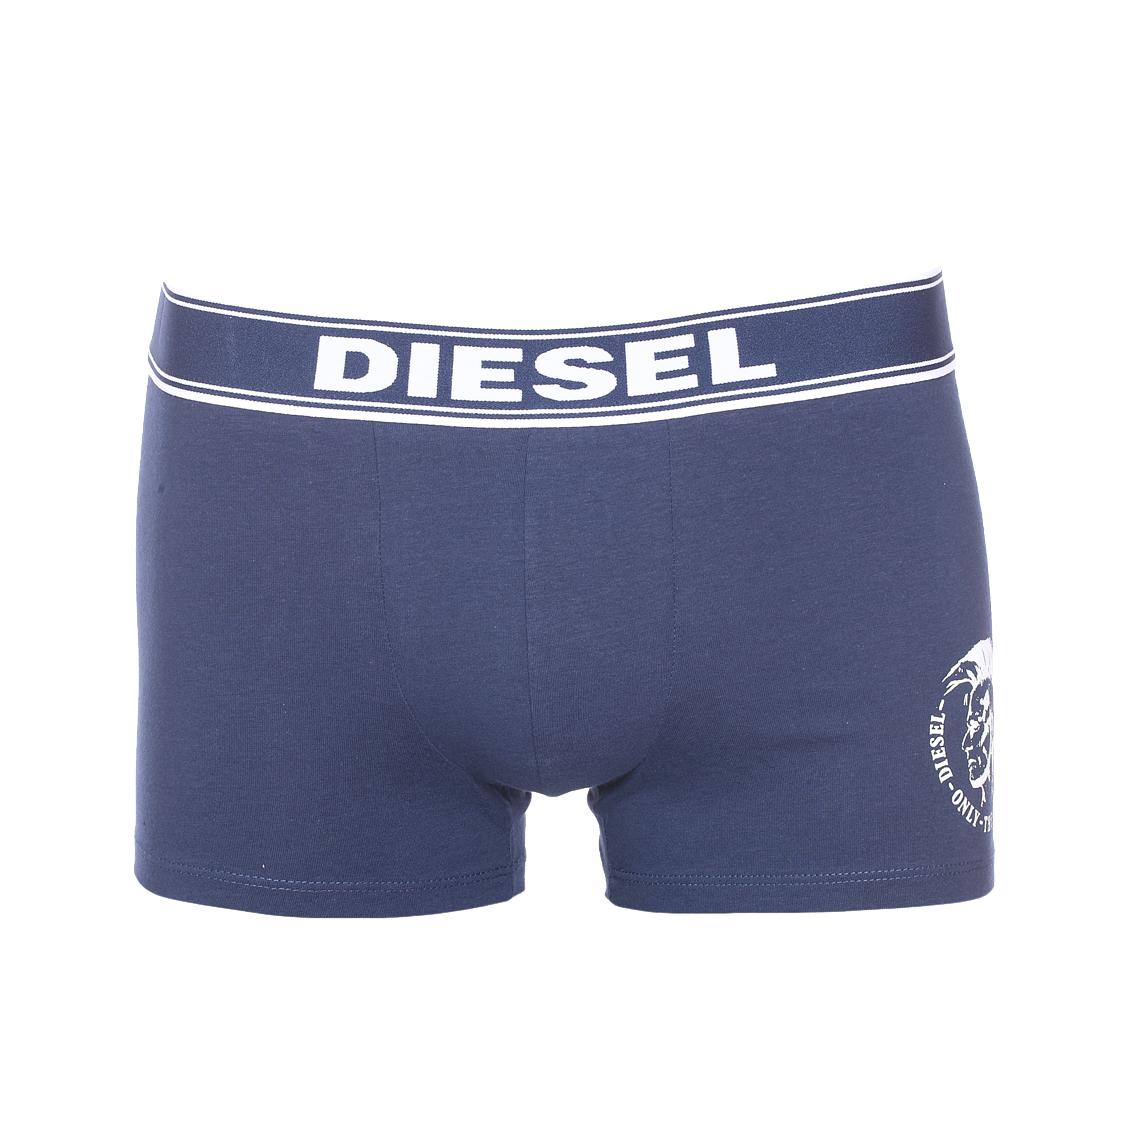 Boxer diesel the essential en coton stretch bleu marine